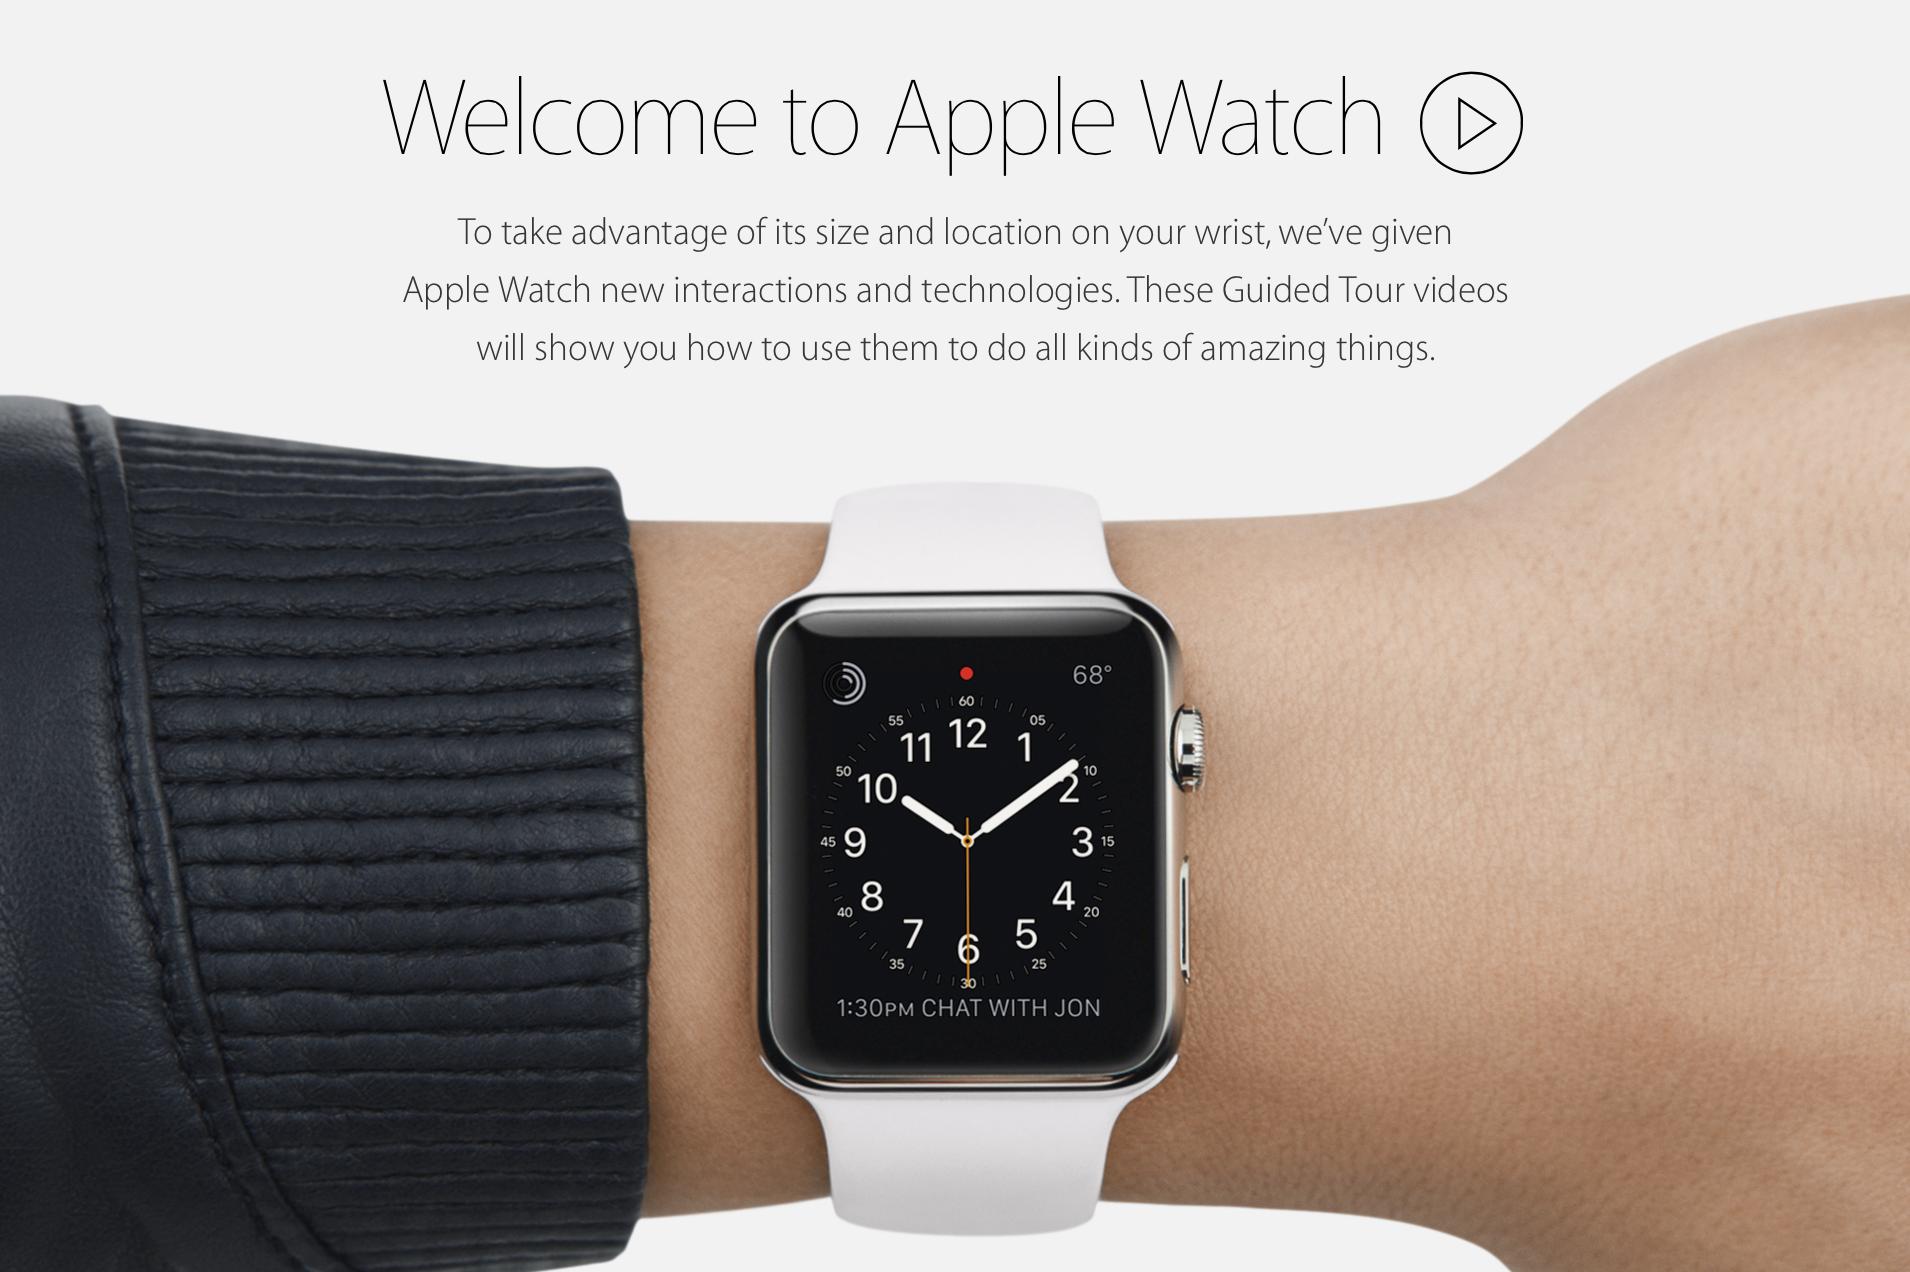 data_applenews_apple_watch_guided_tour